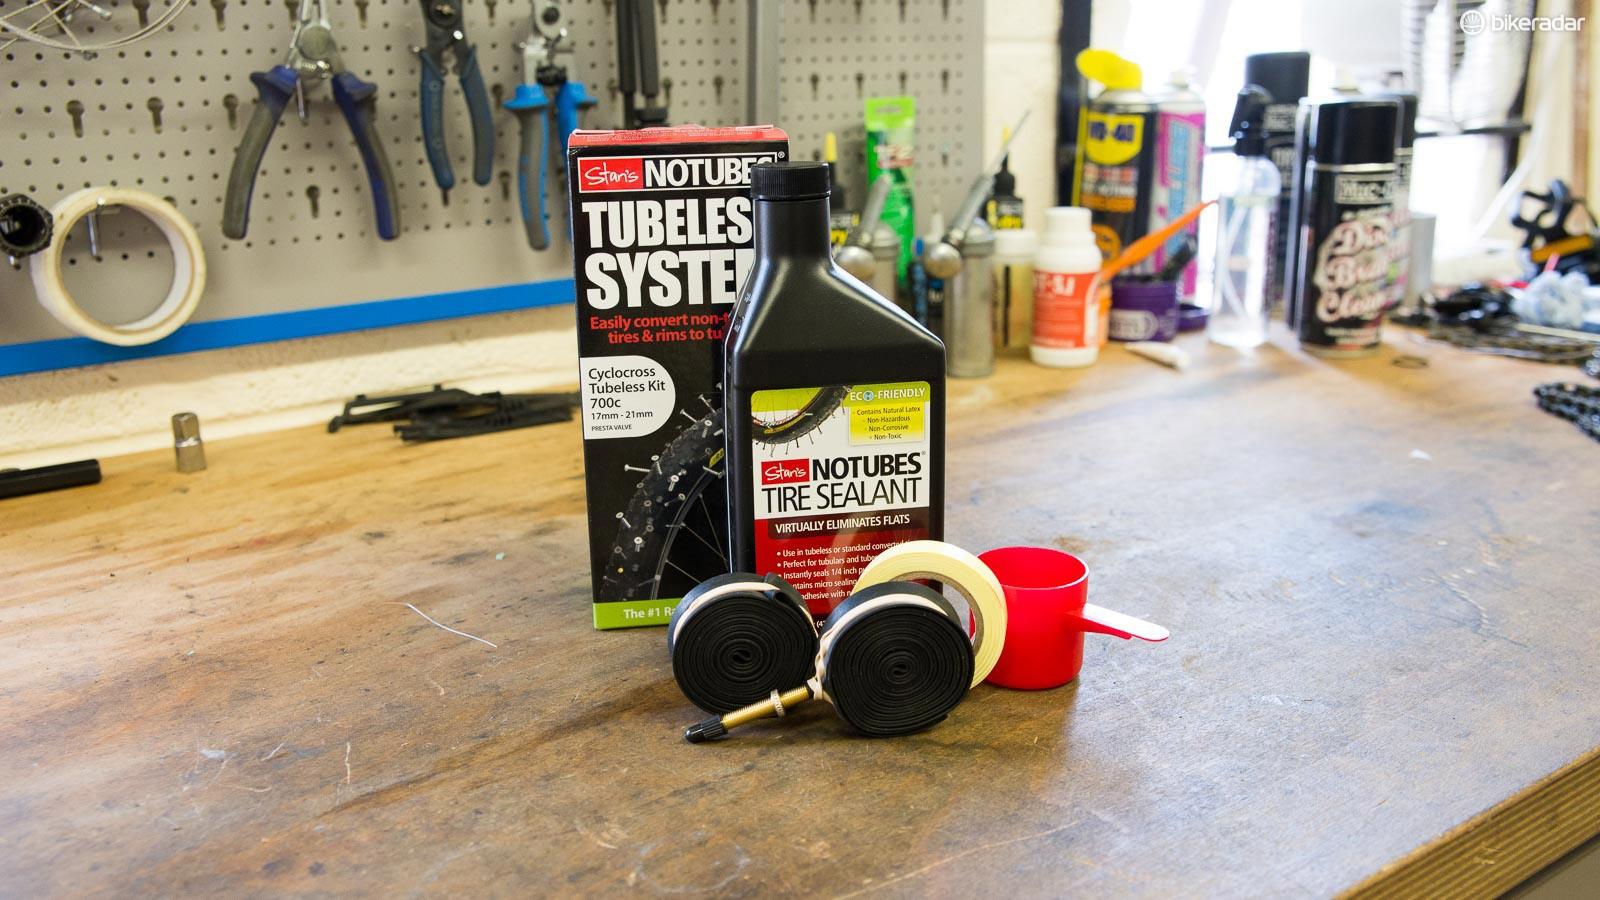 Stan's No Tubes cyclocross kit